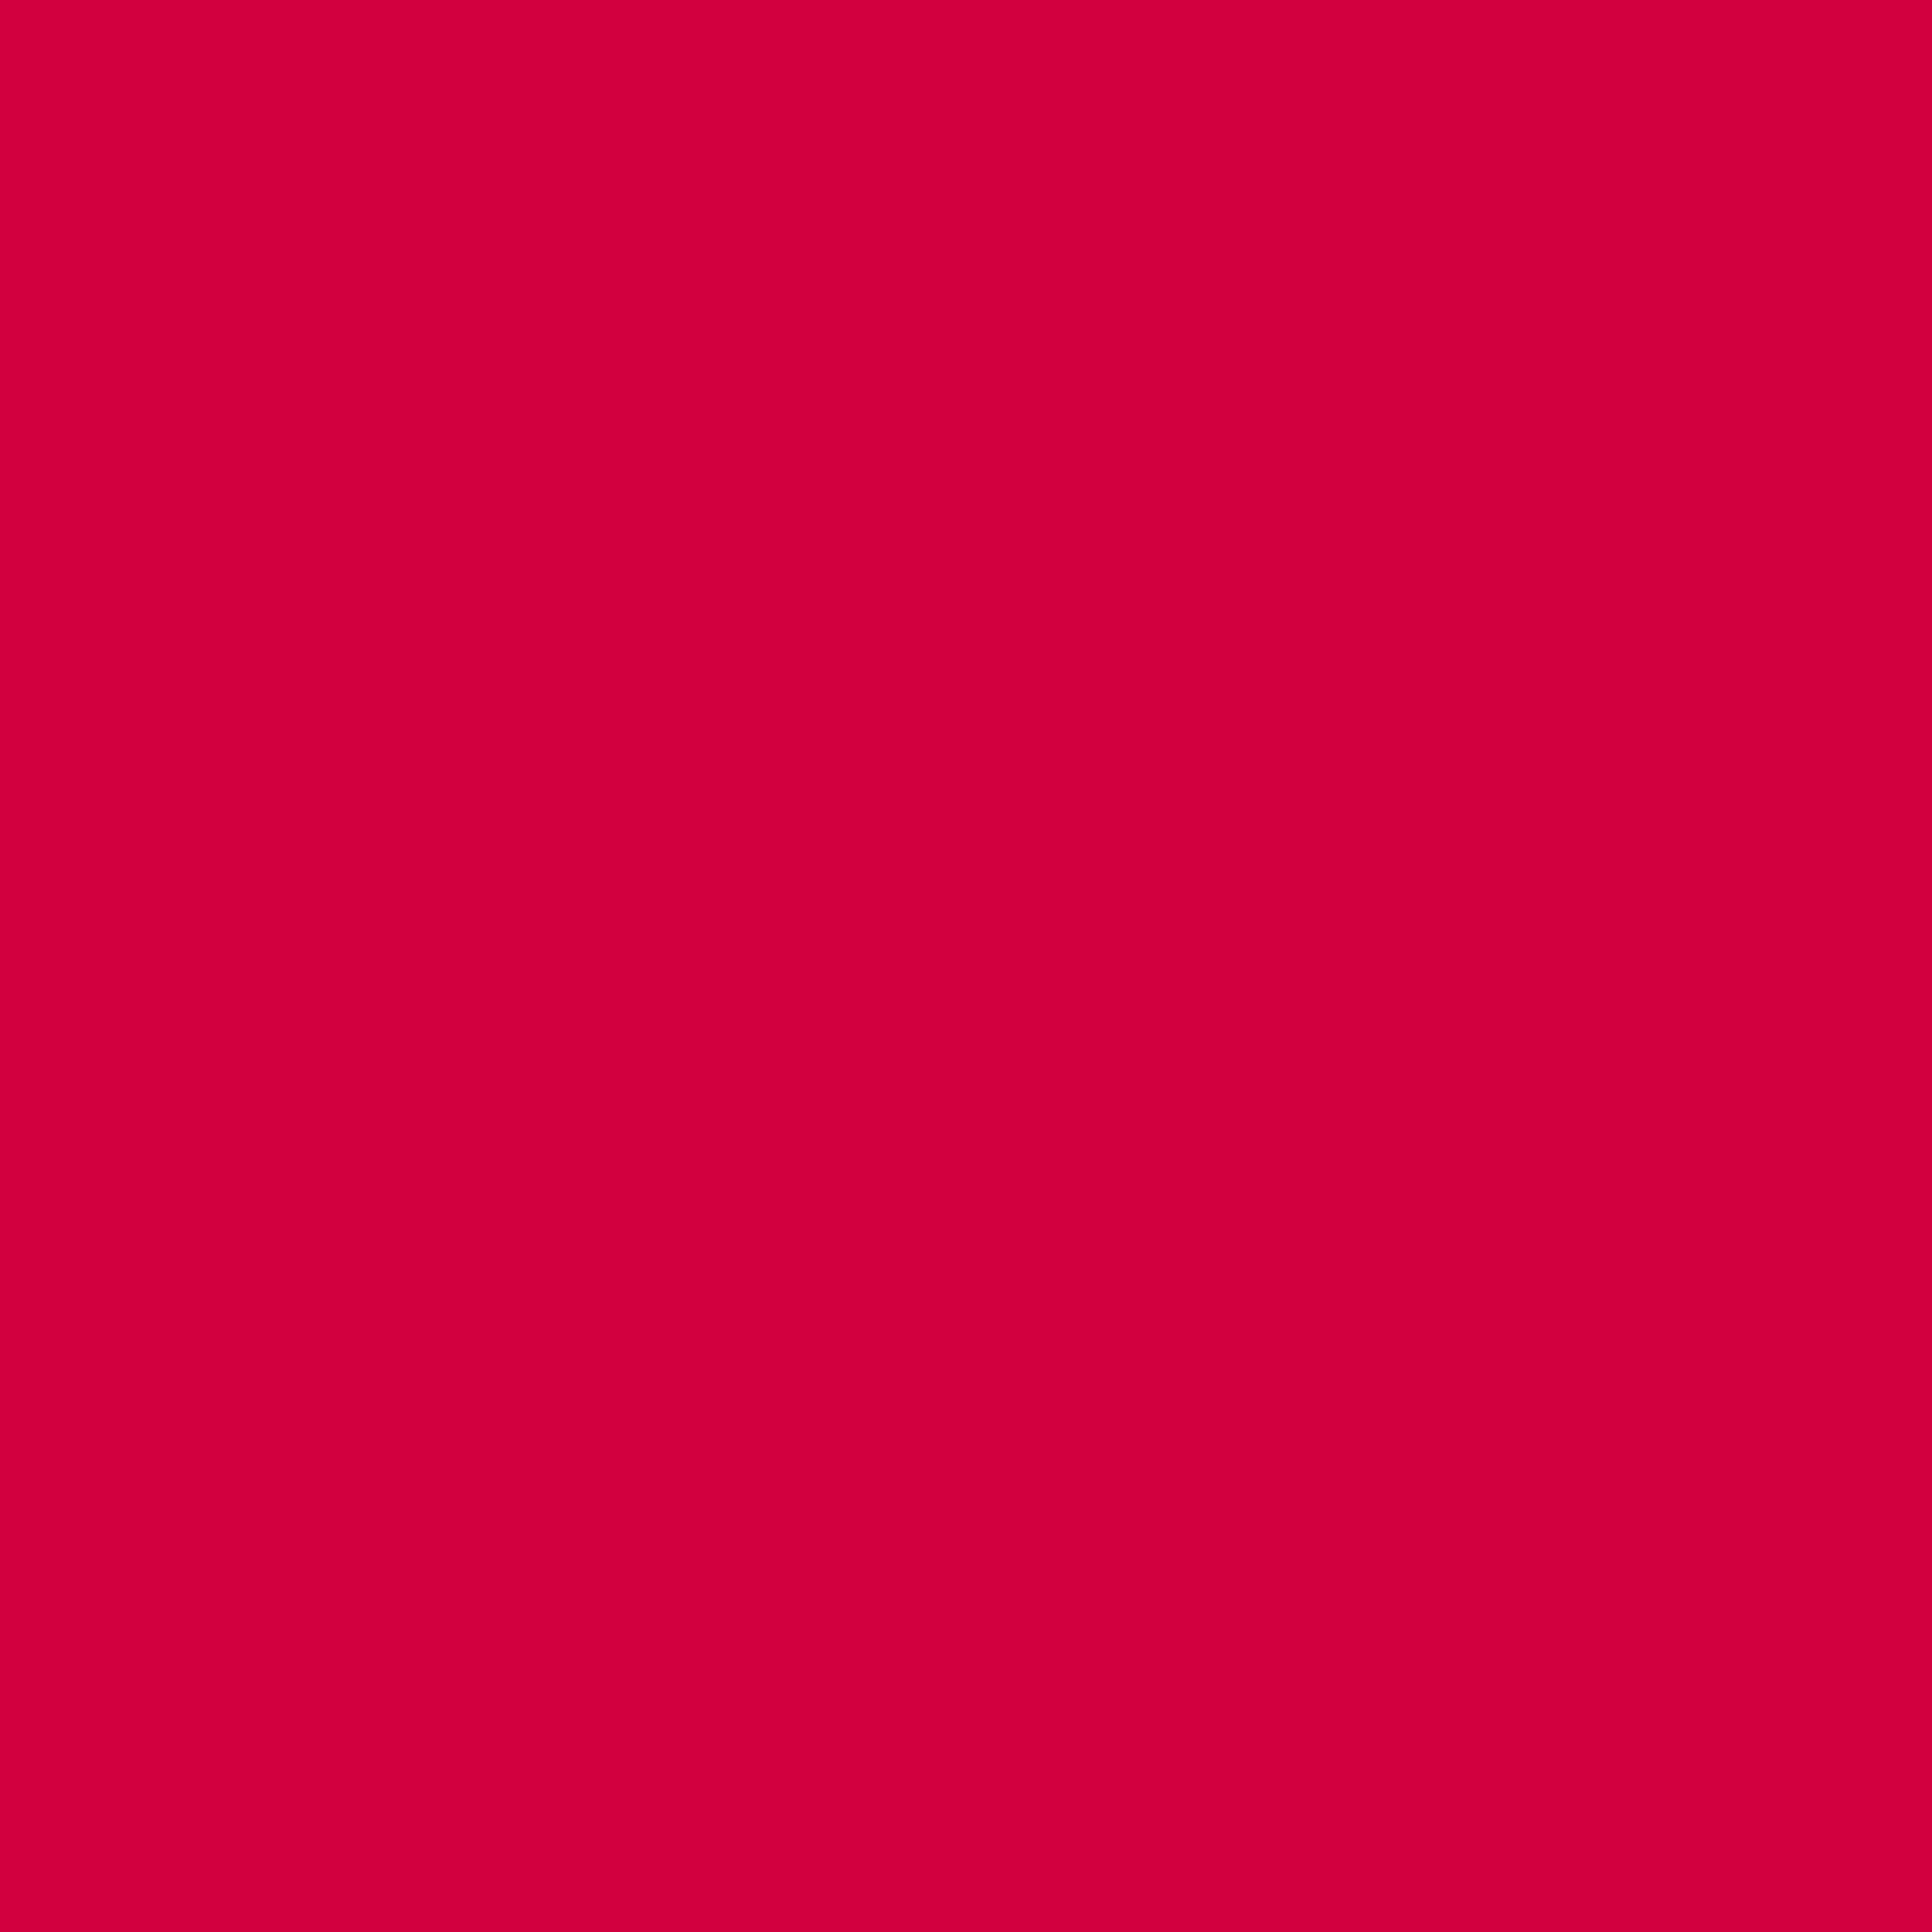 2048x2048 Utah Crimson Solid Color Background